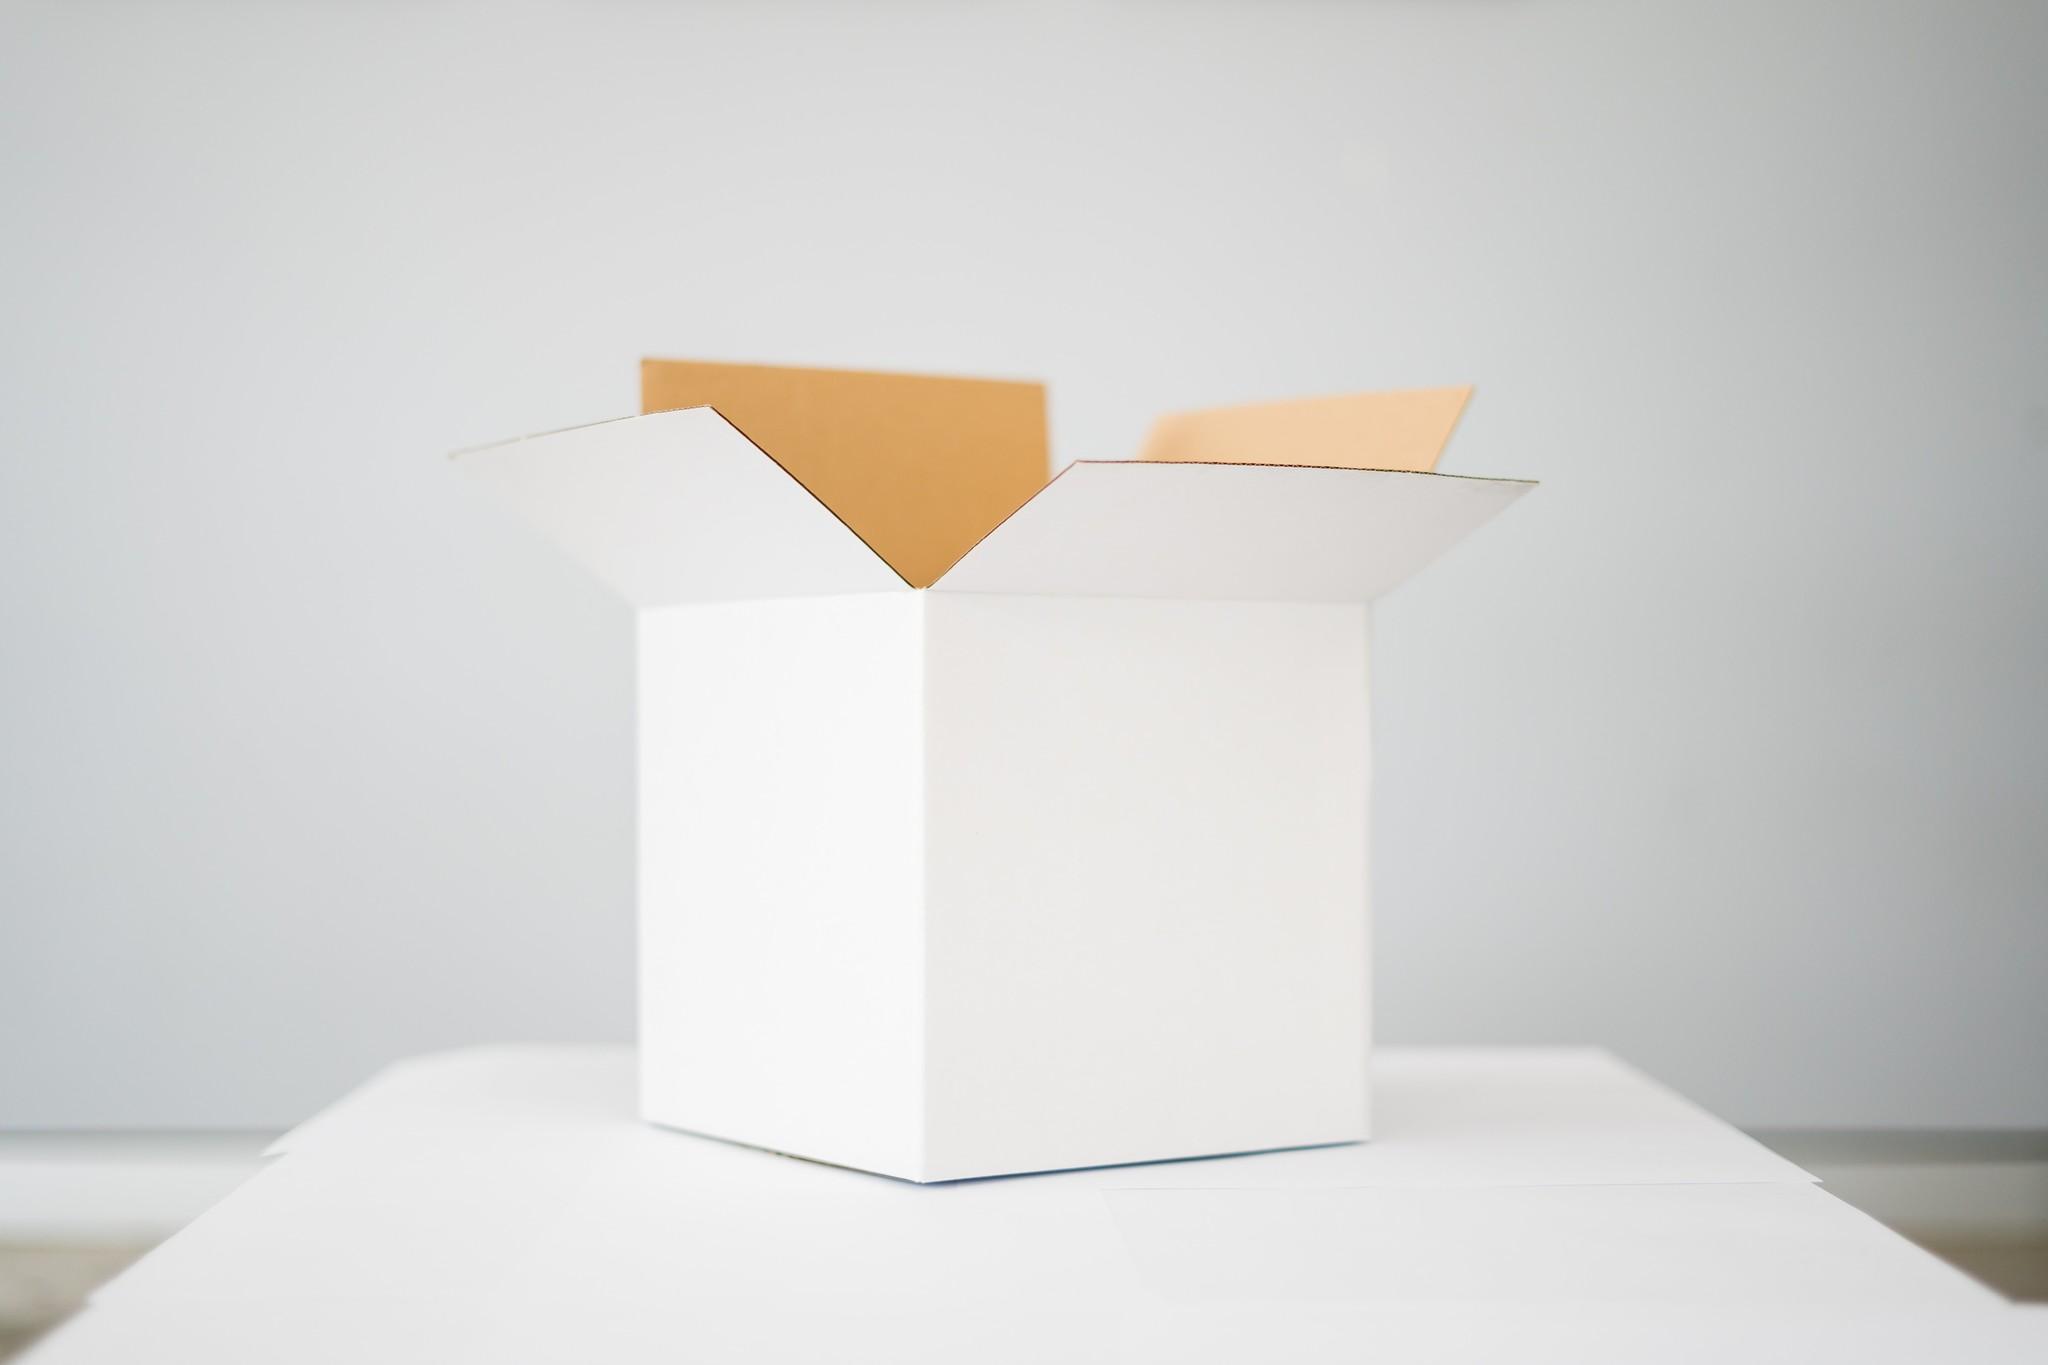 Webshop pakketten verzenden